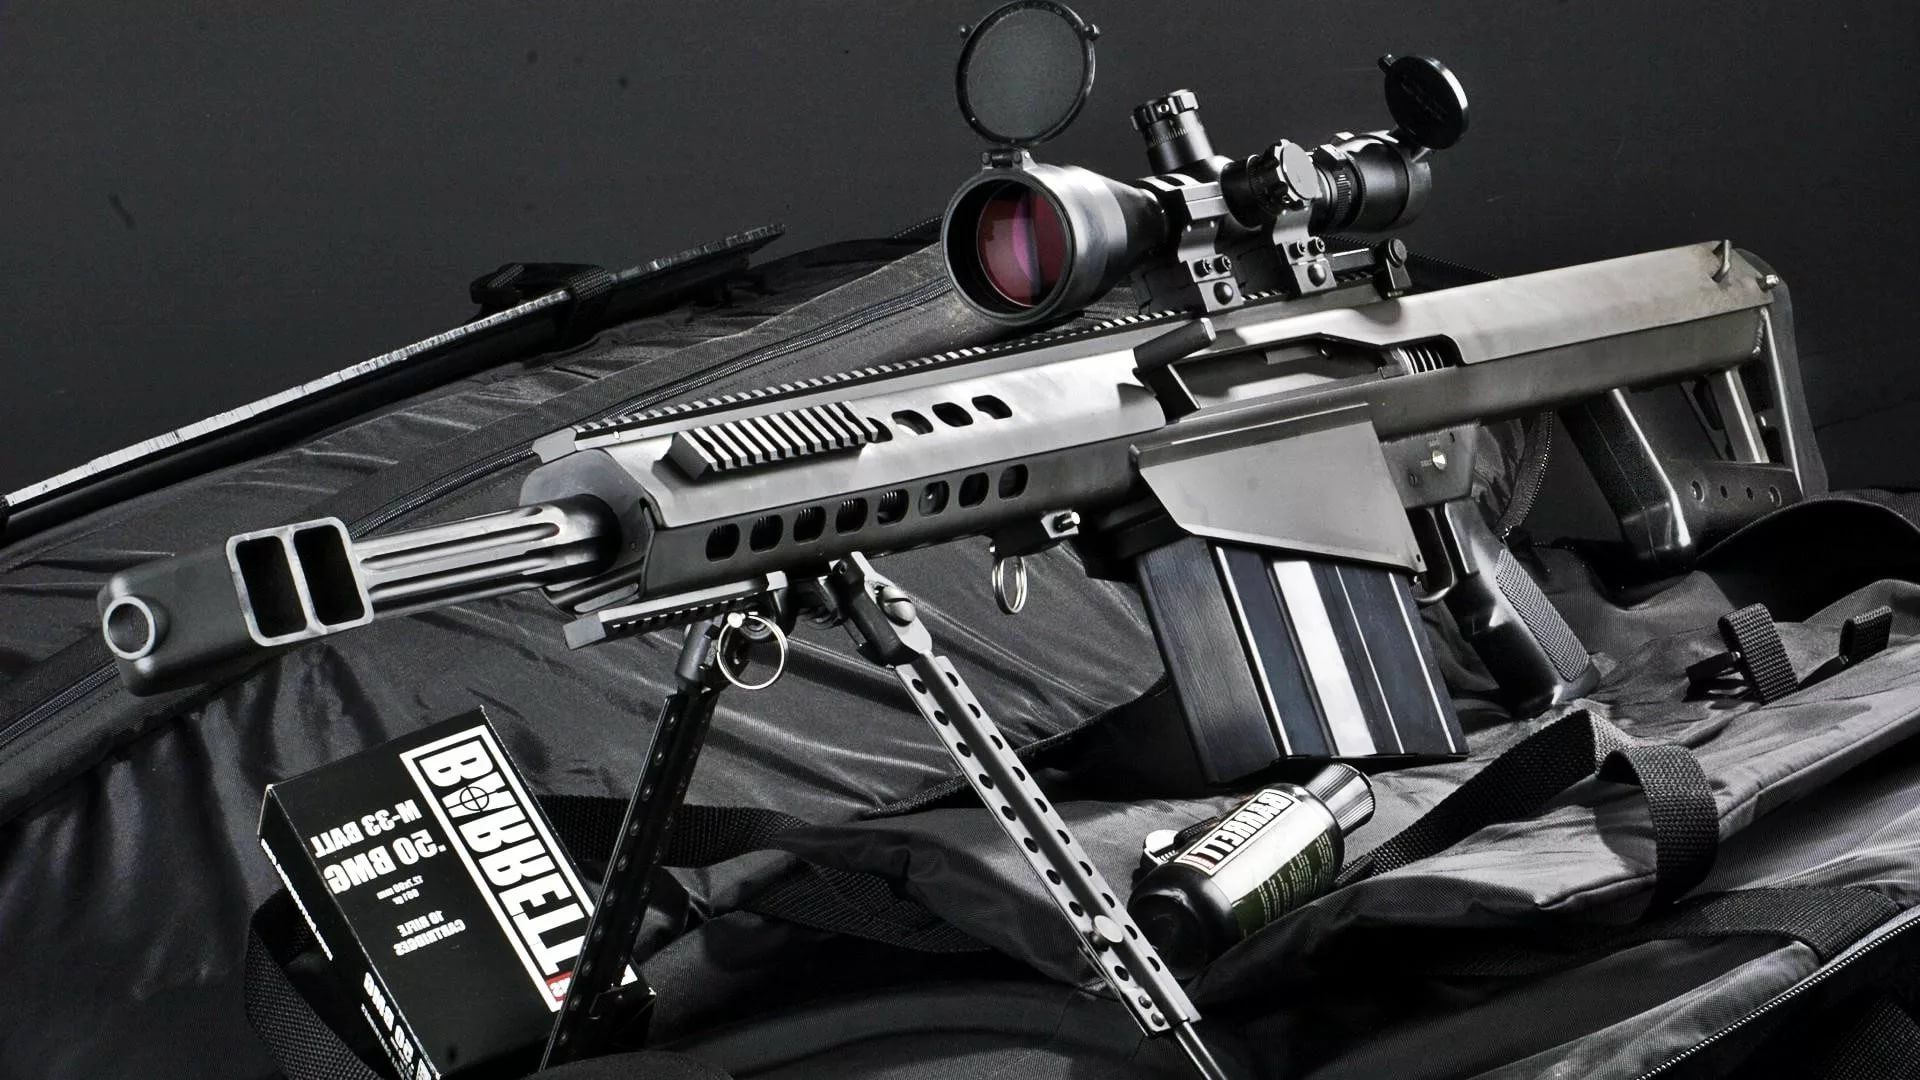 Gun For Desktop Background